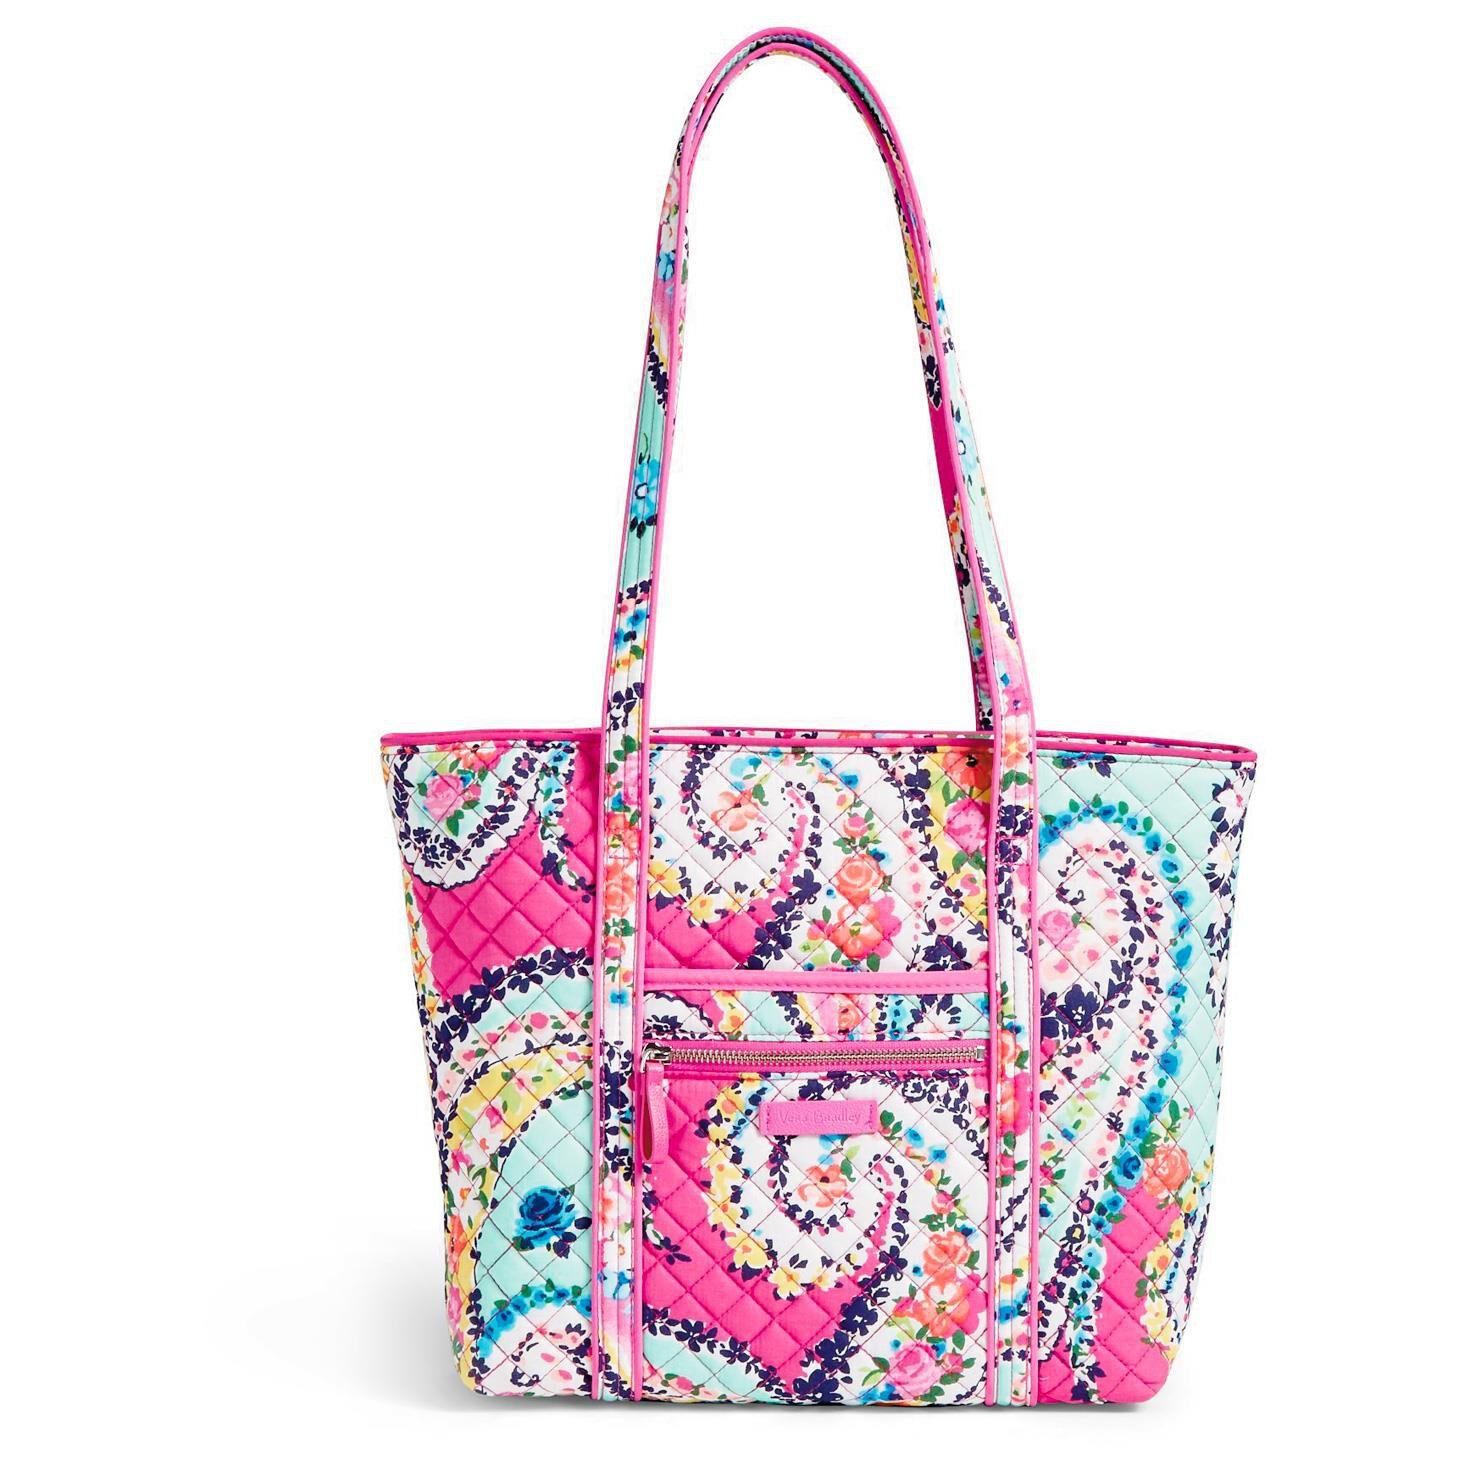 Tote Bag - Mini pink floral tote by VIDA VIDA 4nZEo